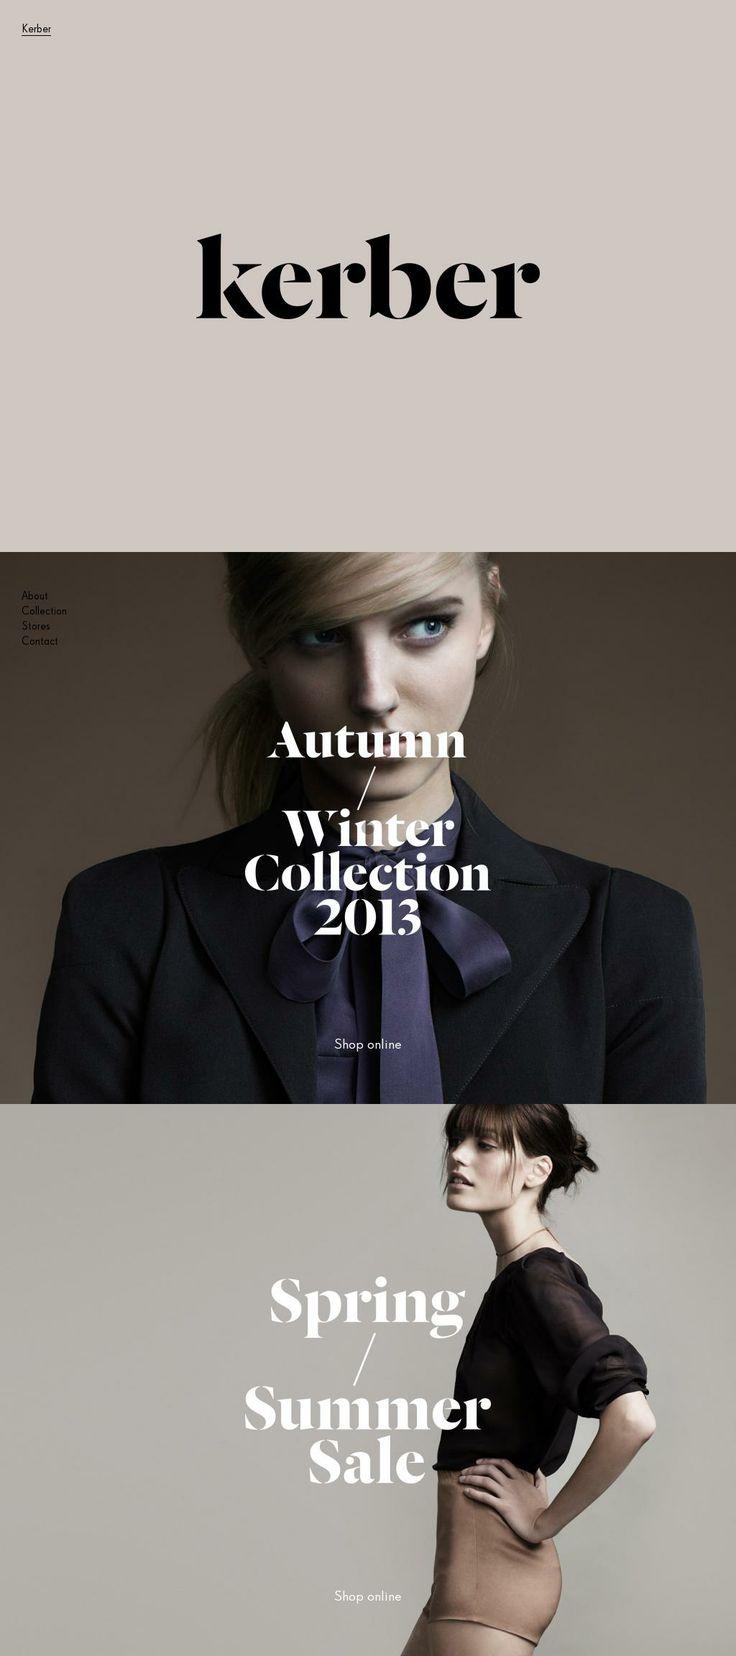 Kerber Website | Design: UI/UX. Apps. Websites | Marielle Kerber |